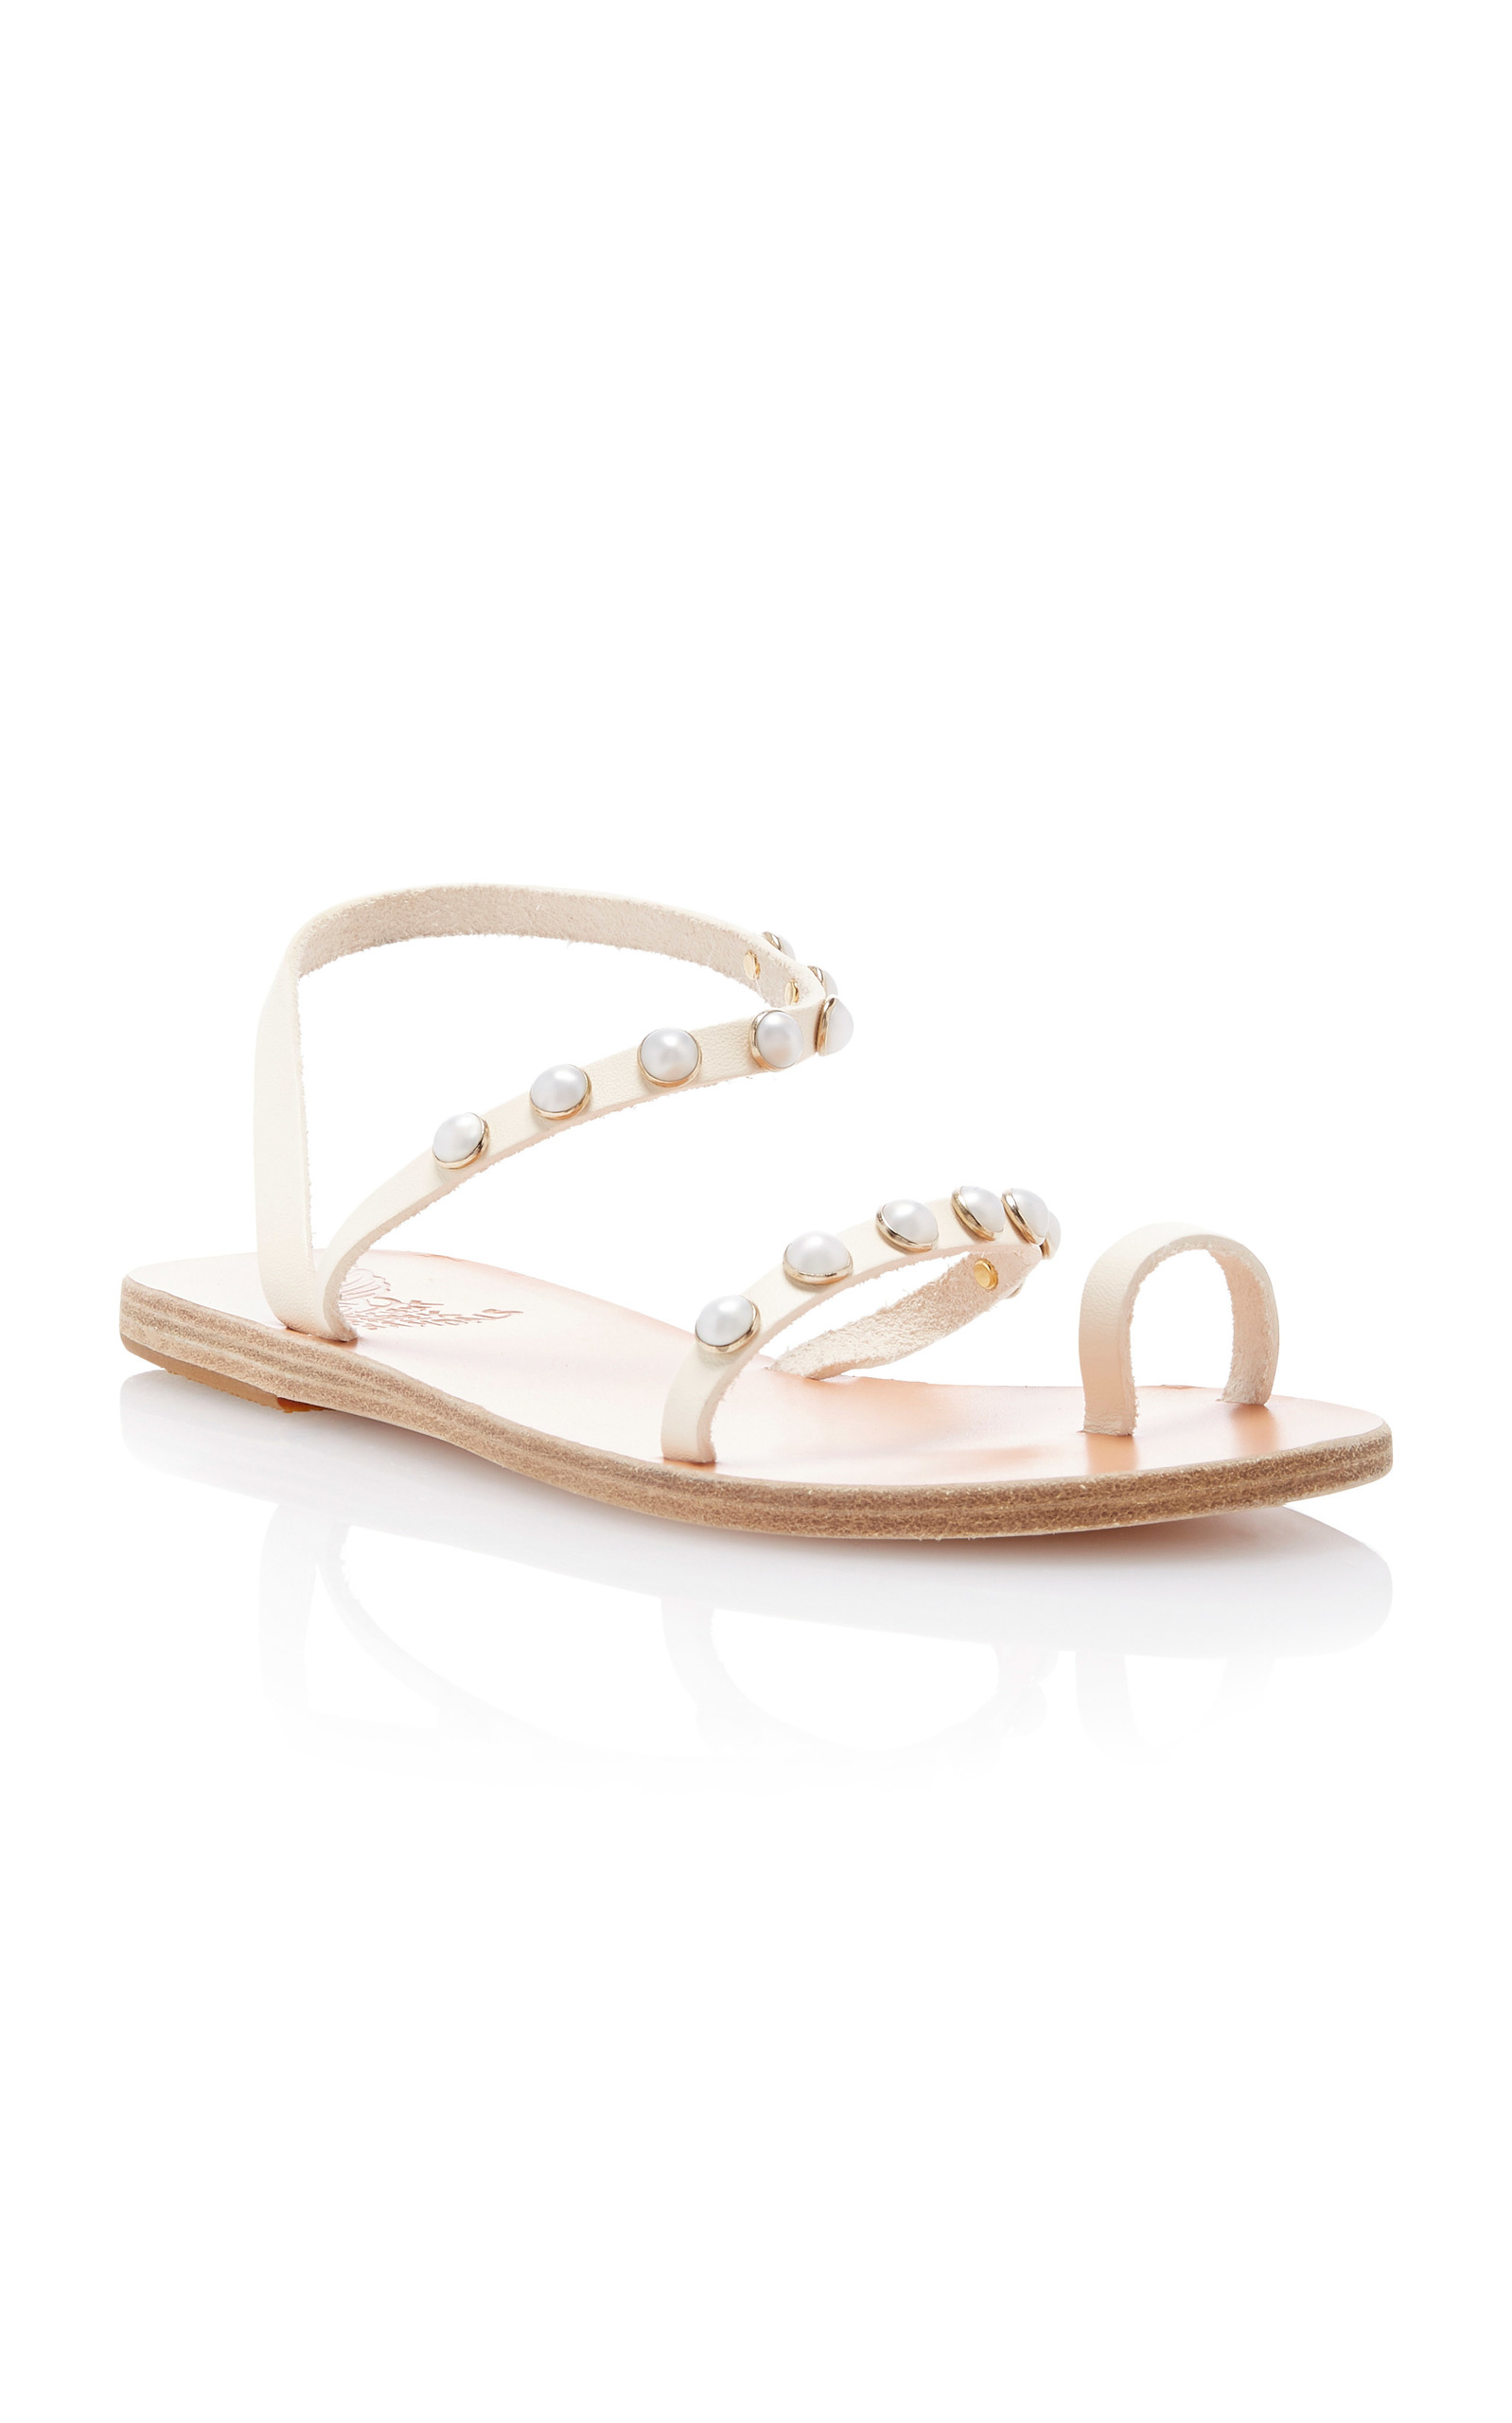 130089bab Ancient Greek SandalsApli Eleftheria Pearl Sandal. CLOSE. Loading